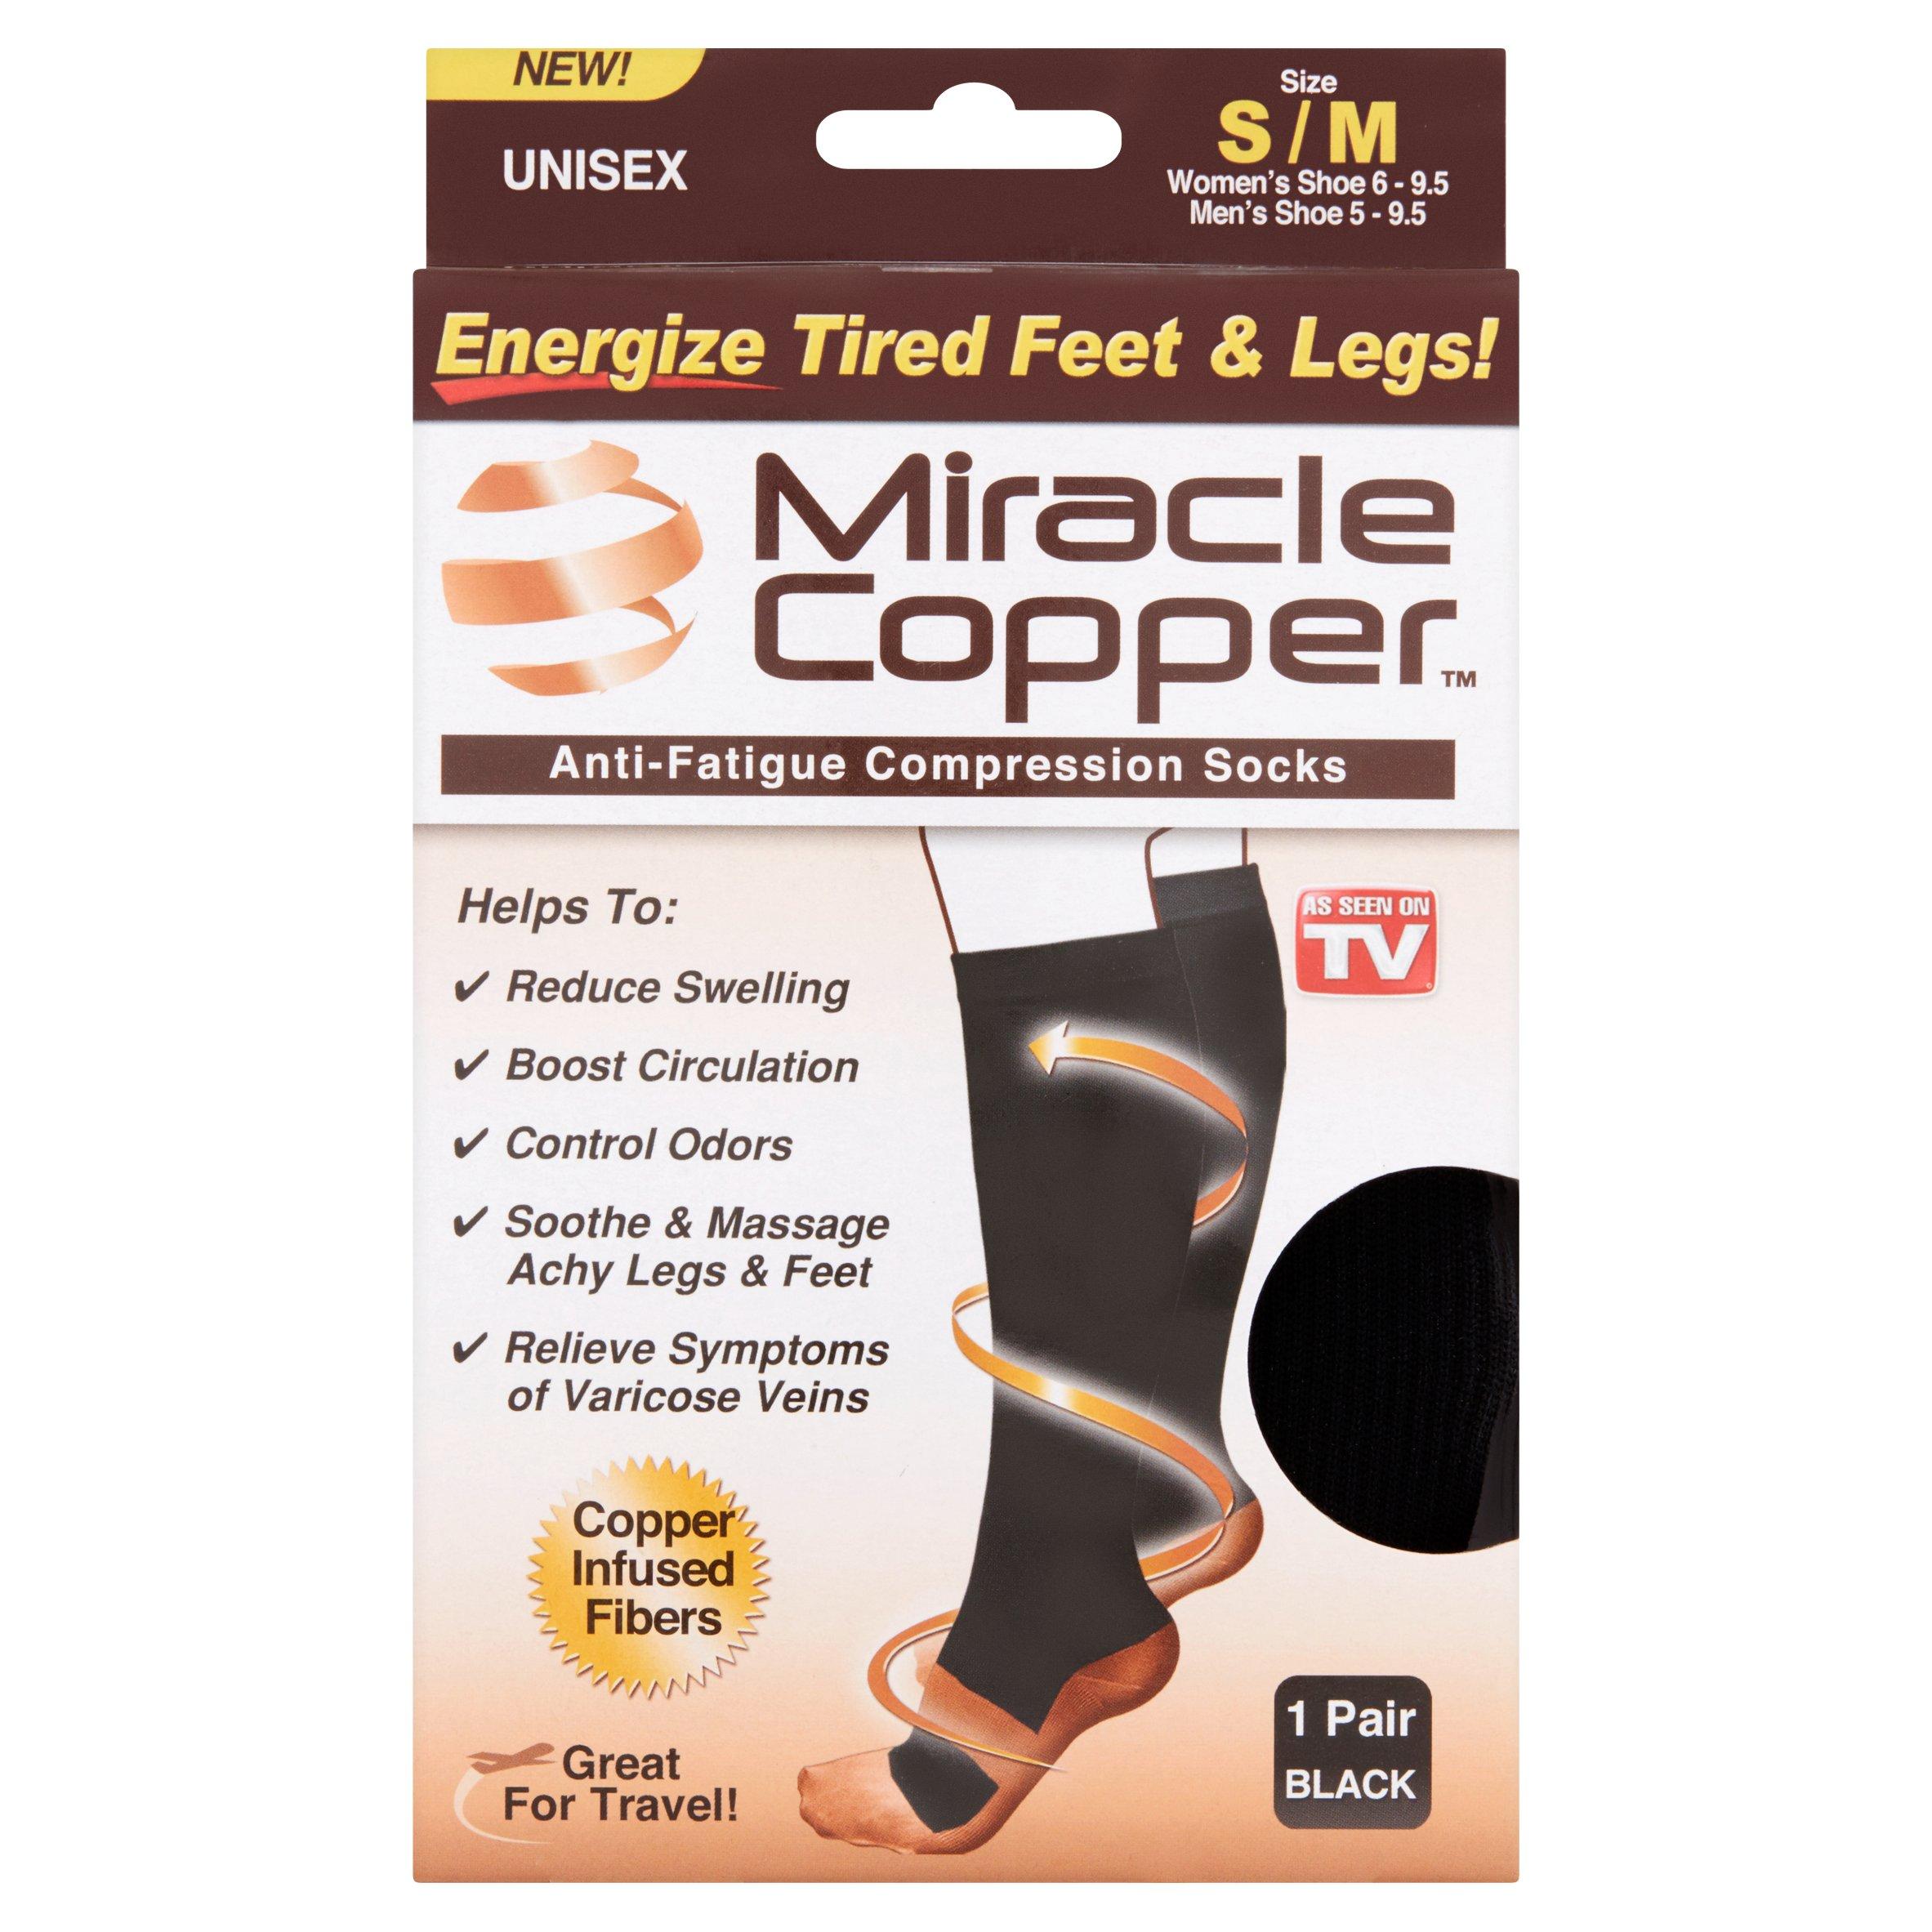 Miracle Copper Unisex Anti-Fatigue Compression Socks, S/M